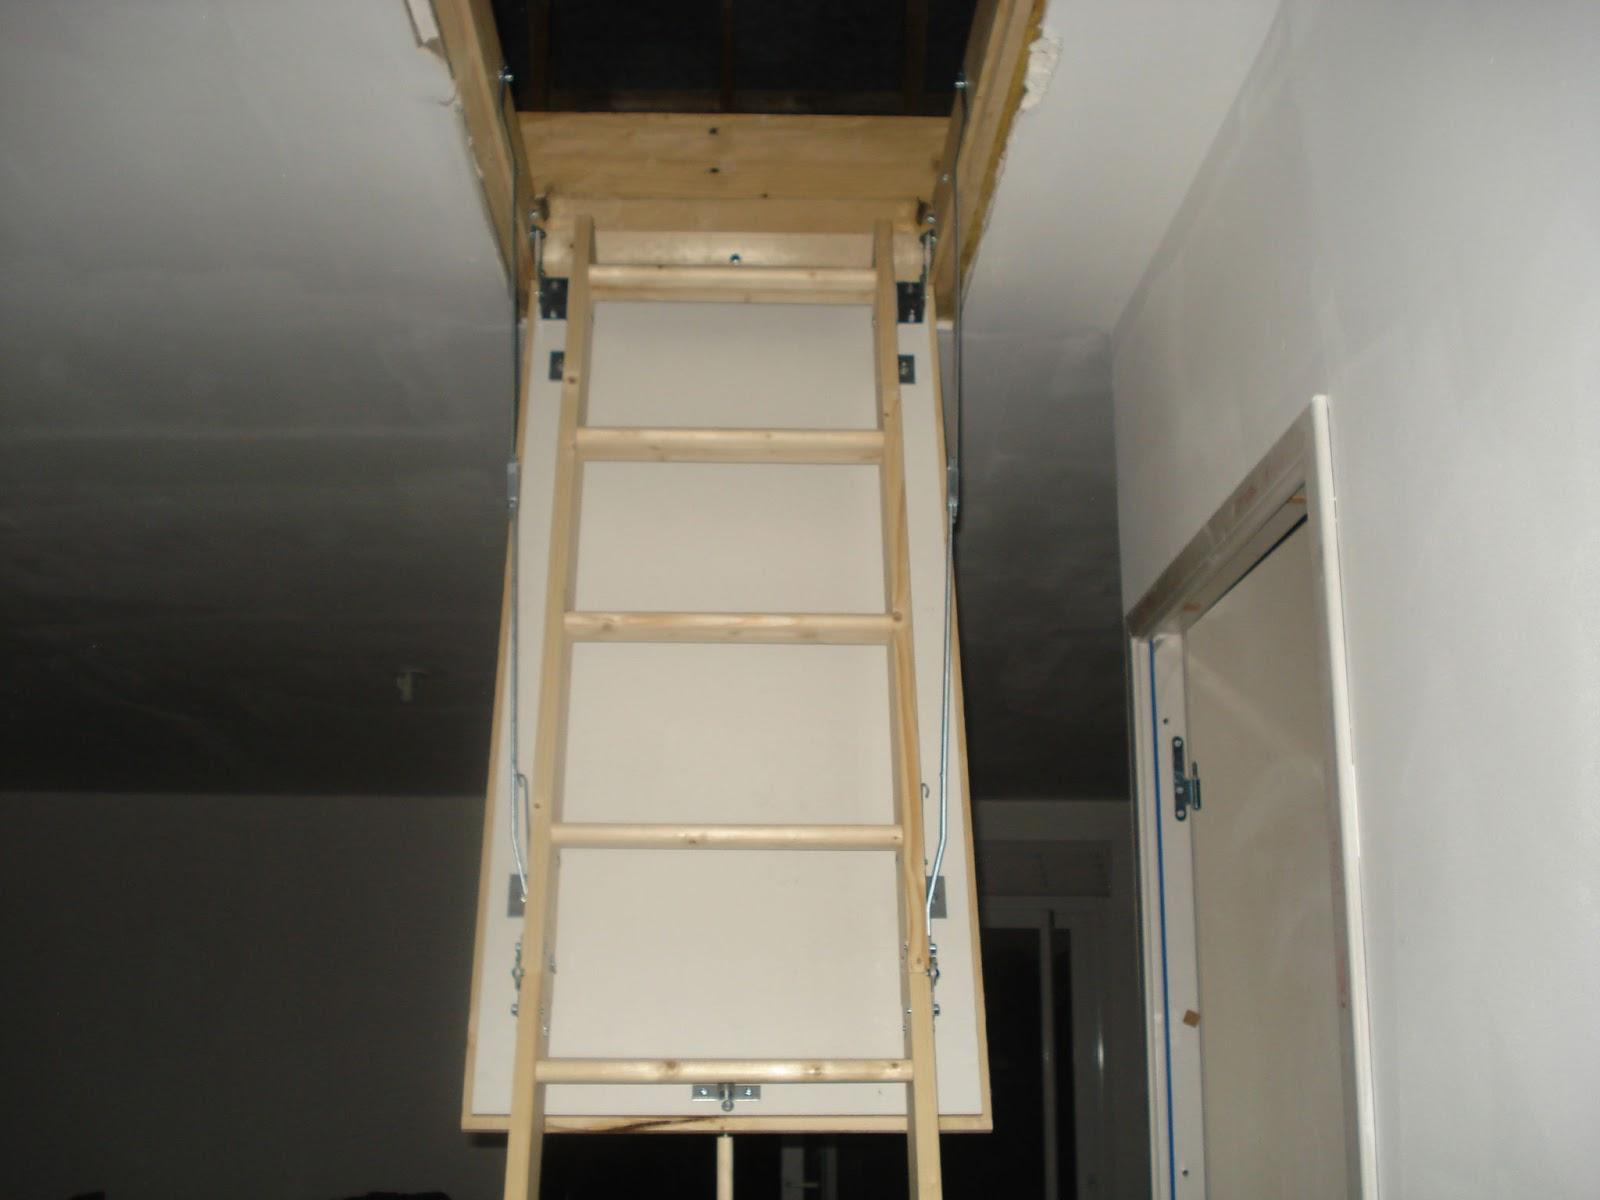 poser un escalier escamotable trendy escalier escamotable garage attic stair with poser un. Black Bedroom Furniture Sets. Home Design Ideas